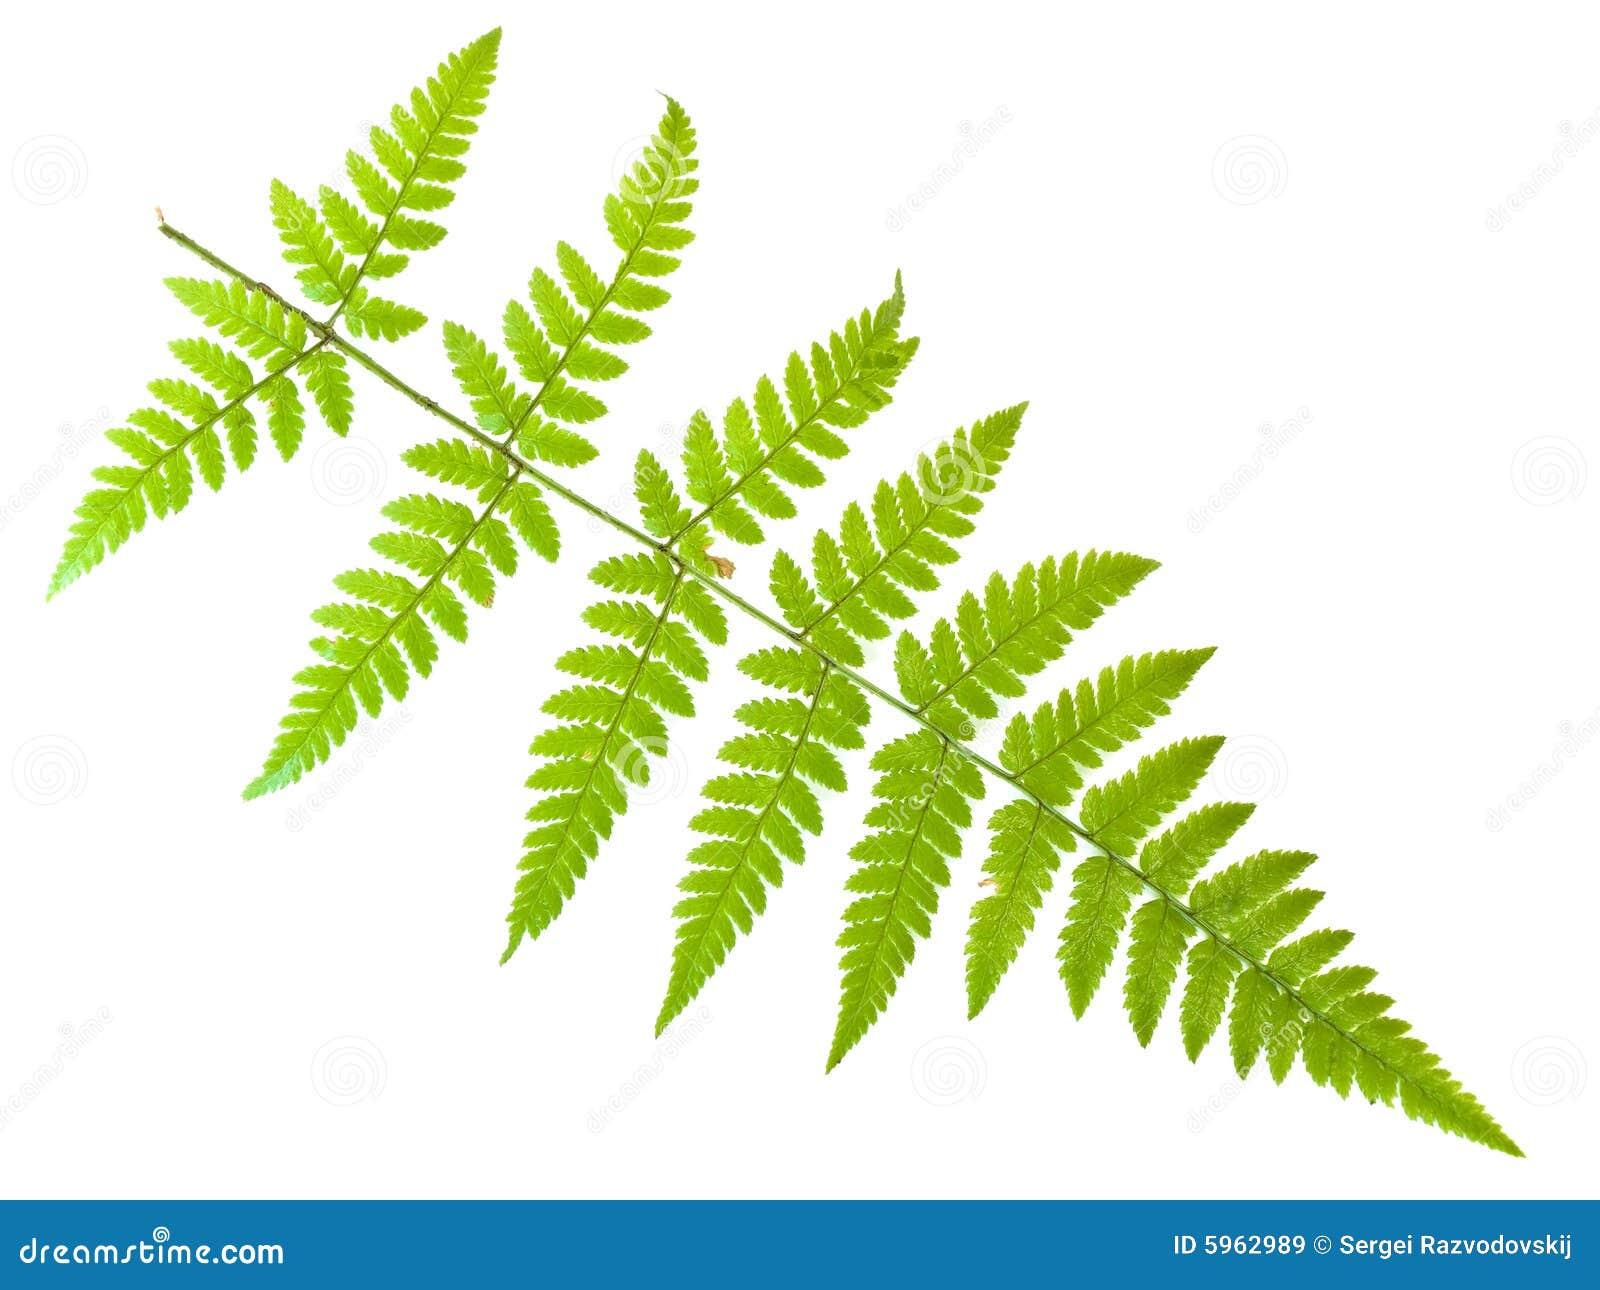 fern leaf royalty free stock images image 5962989